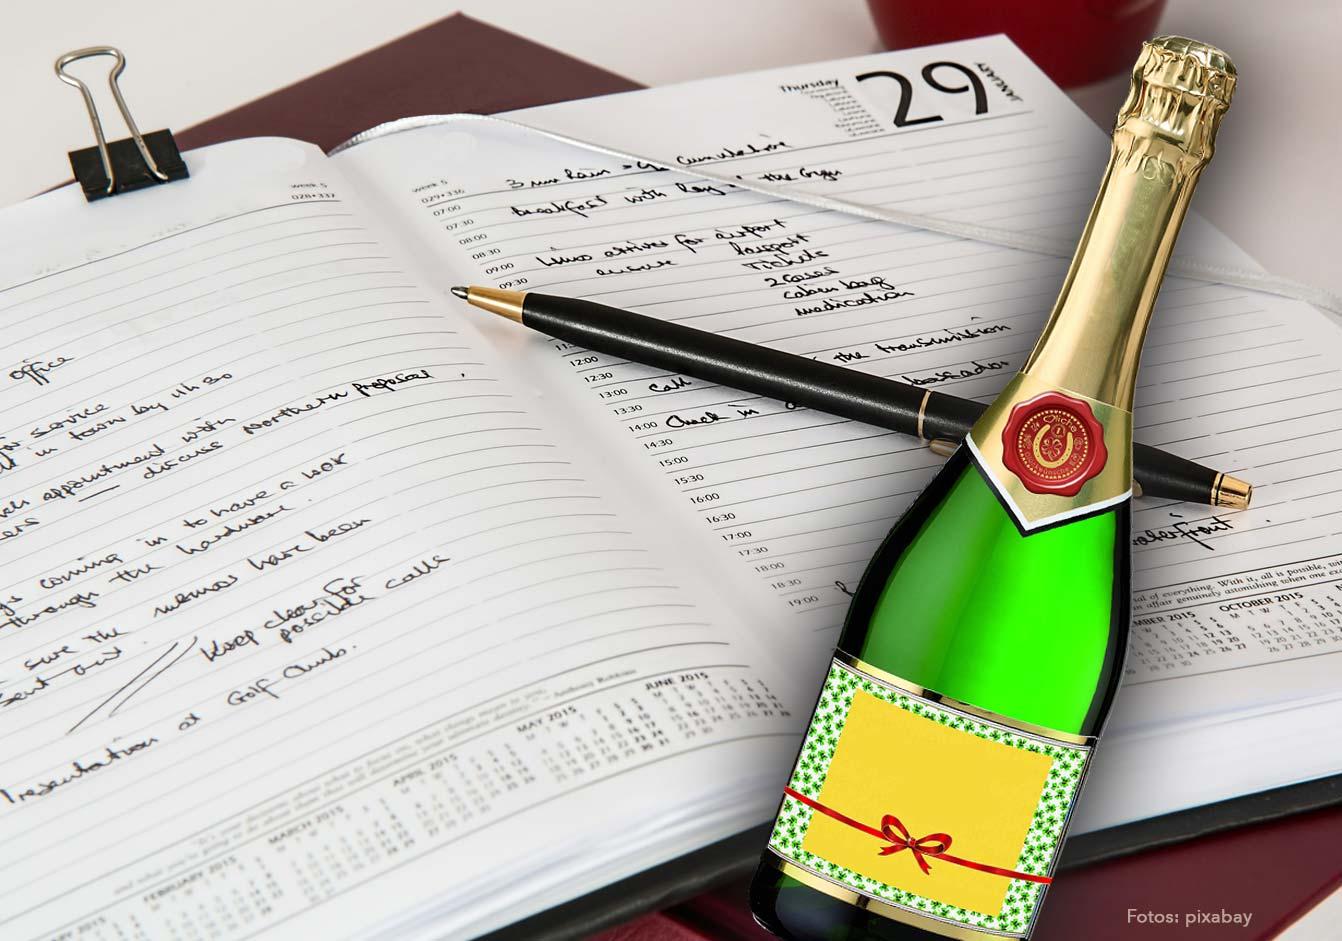 Die Champagner-Wette